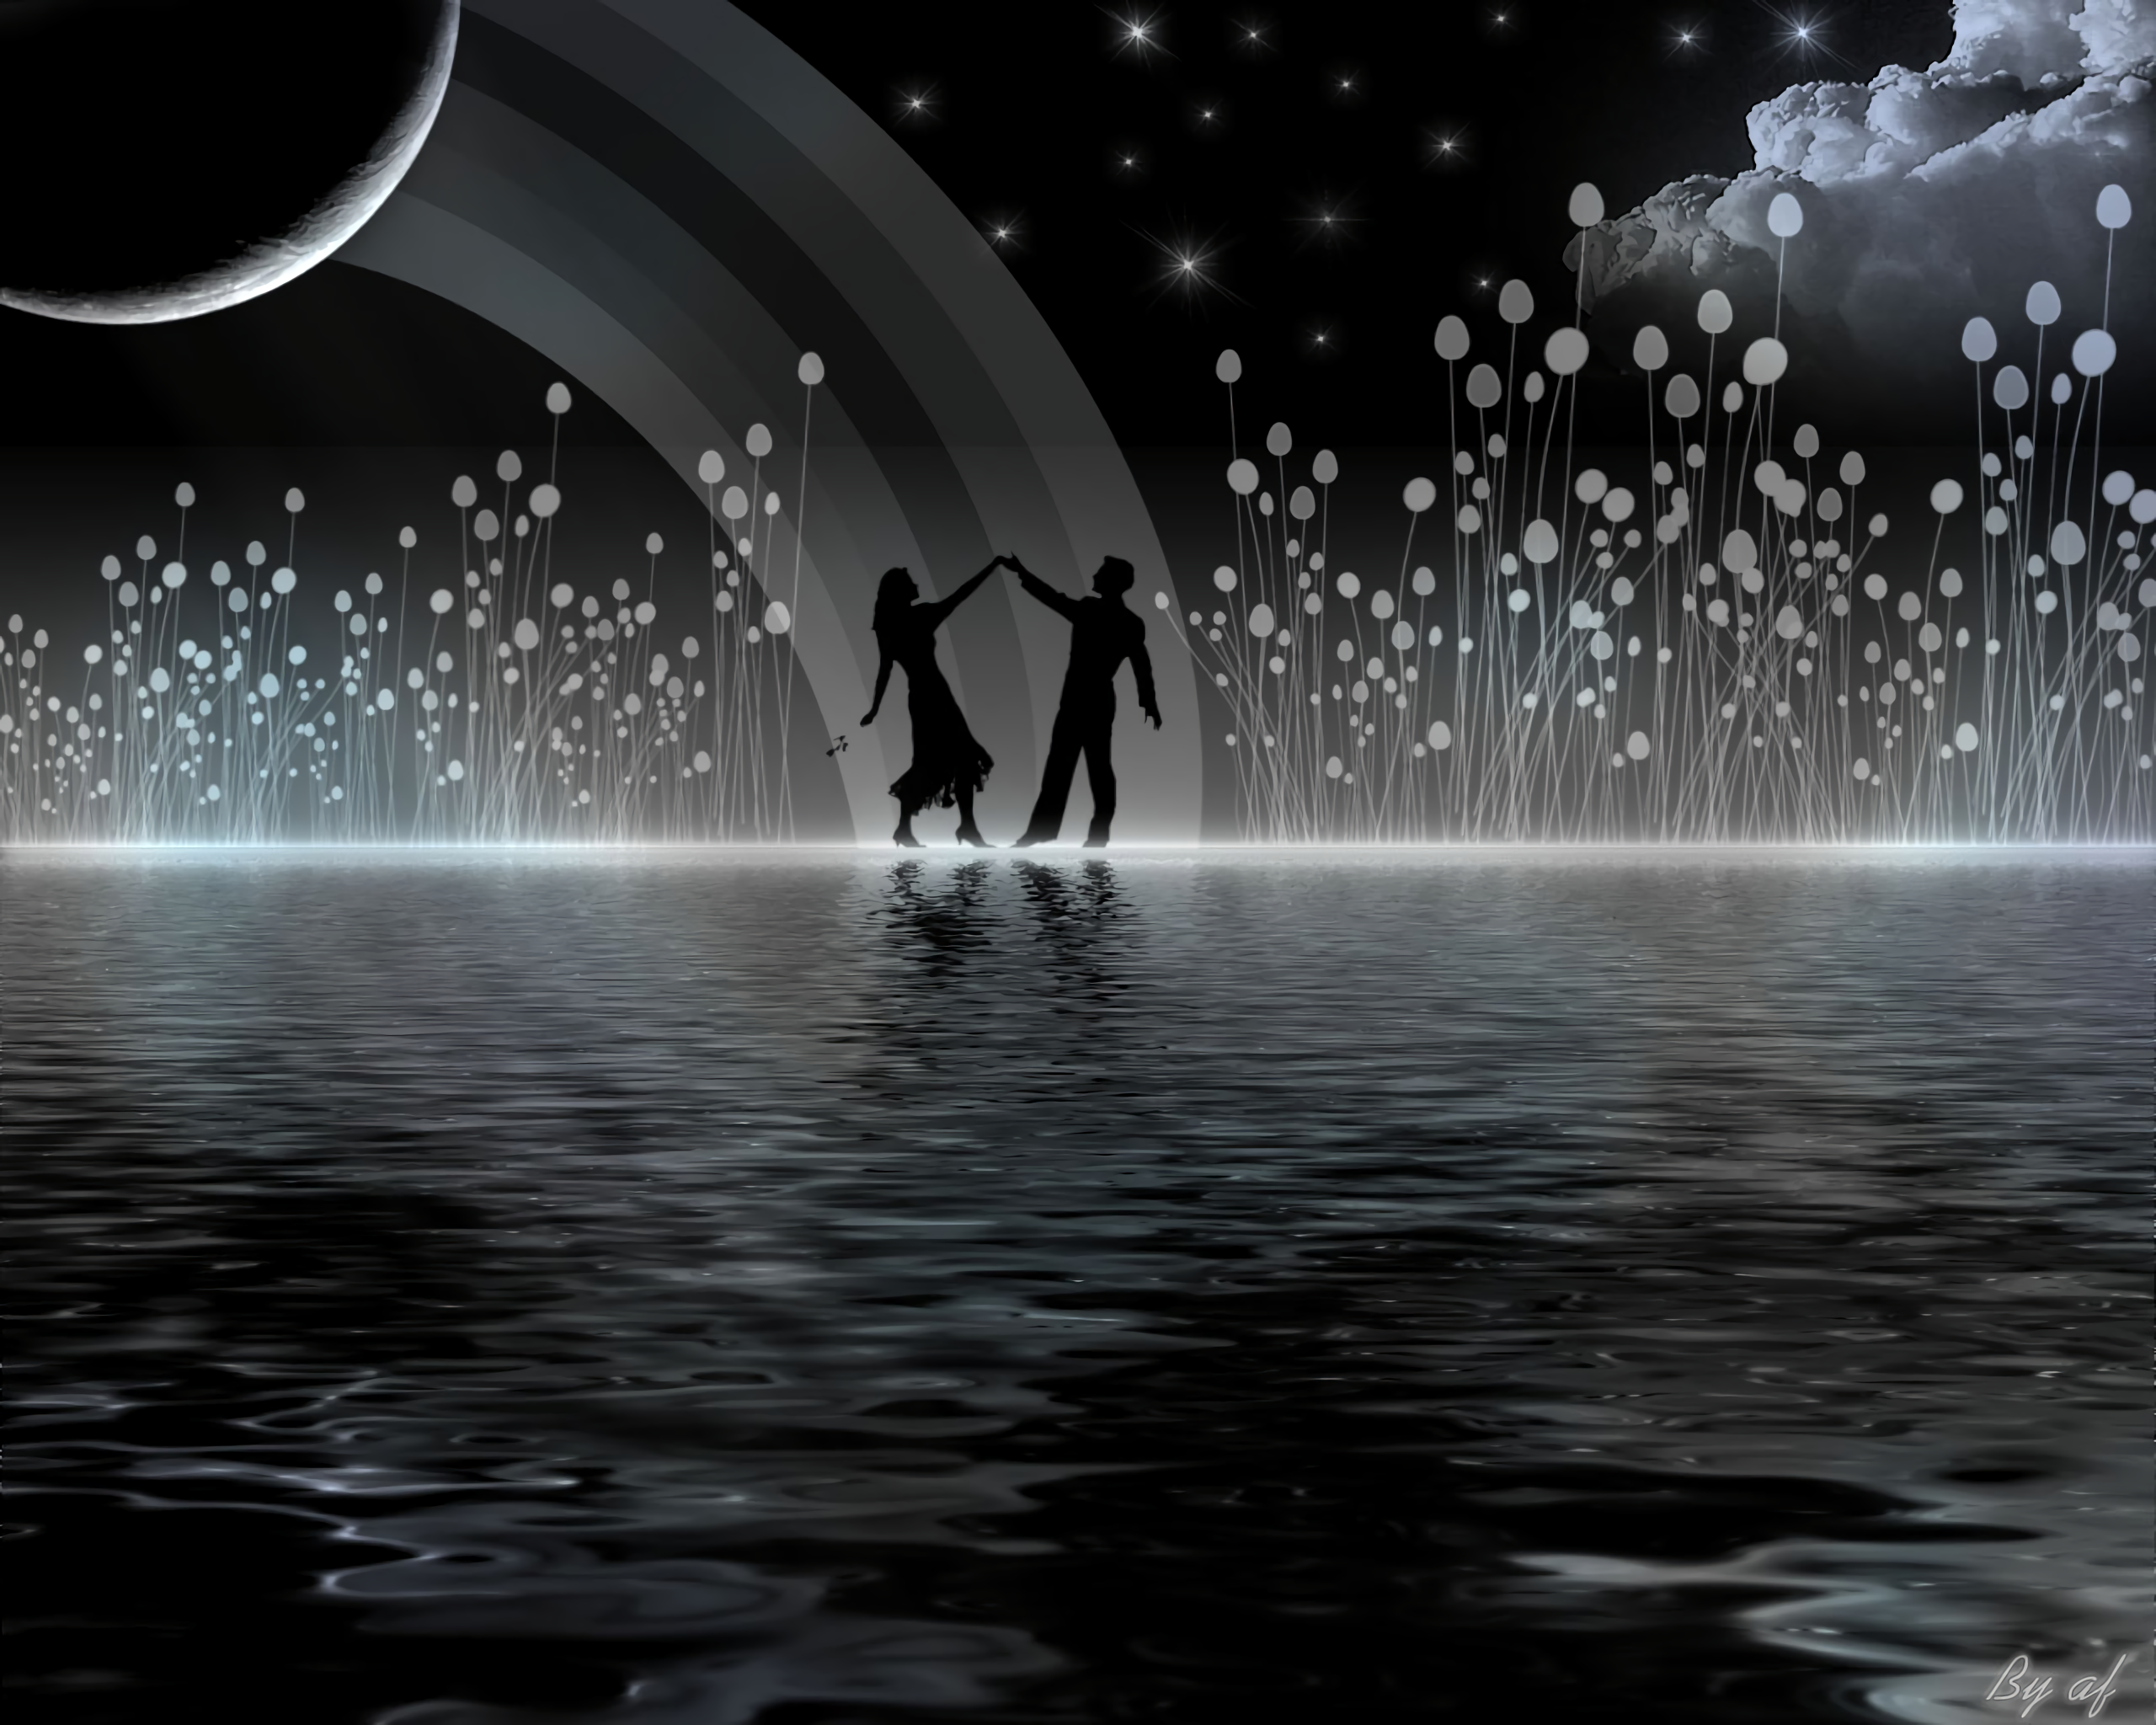 Love hd wallpaper background image 2560x2048 id - Love wallpaper hd ...